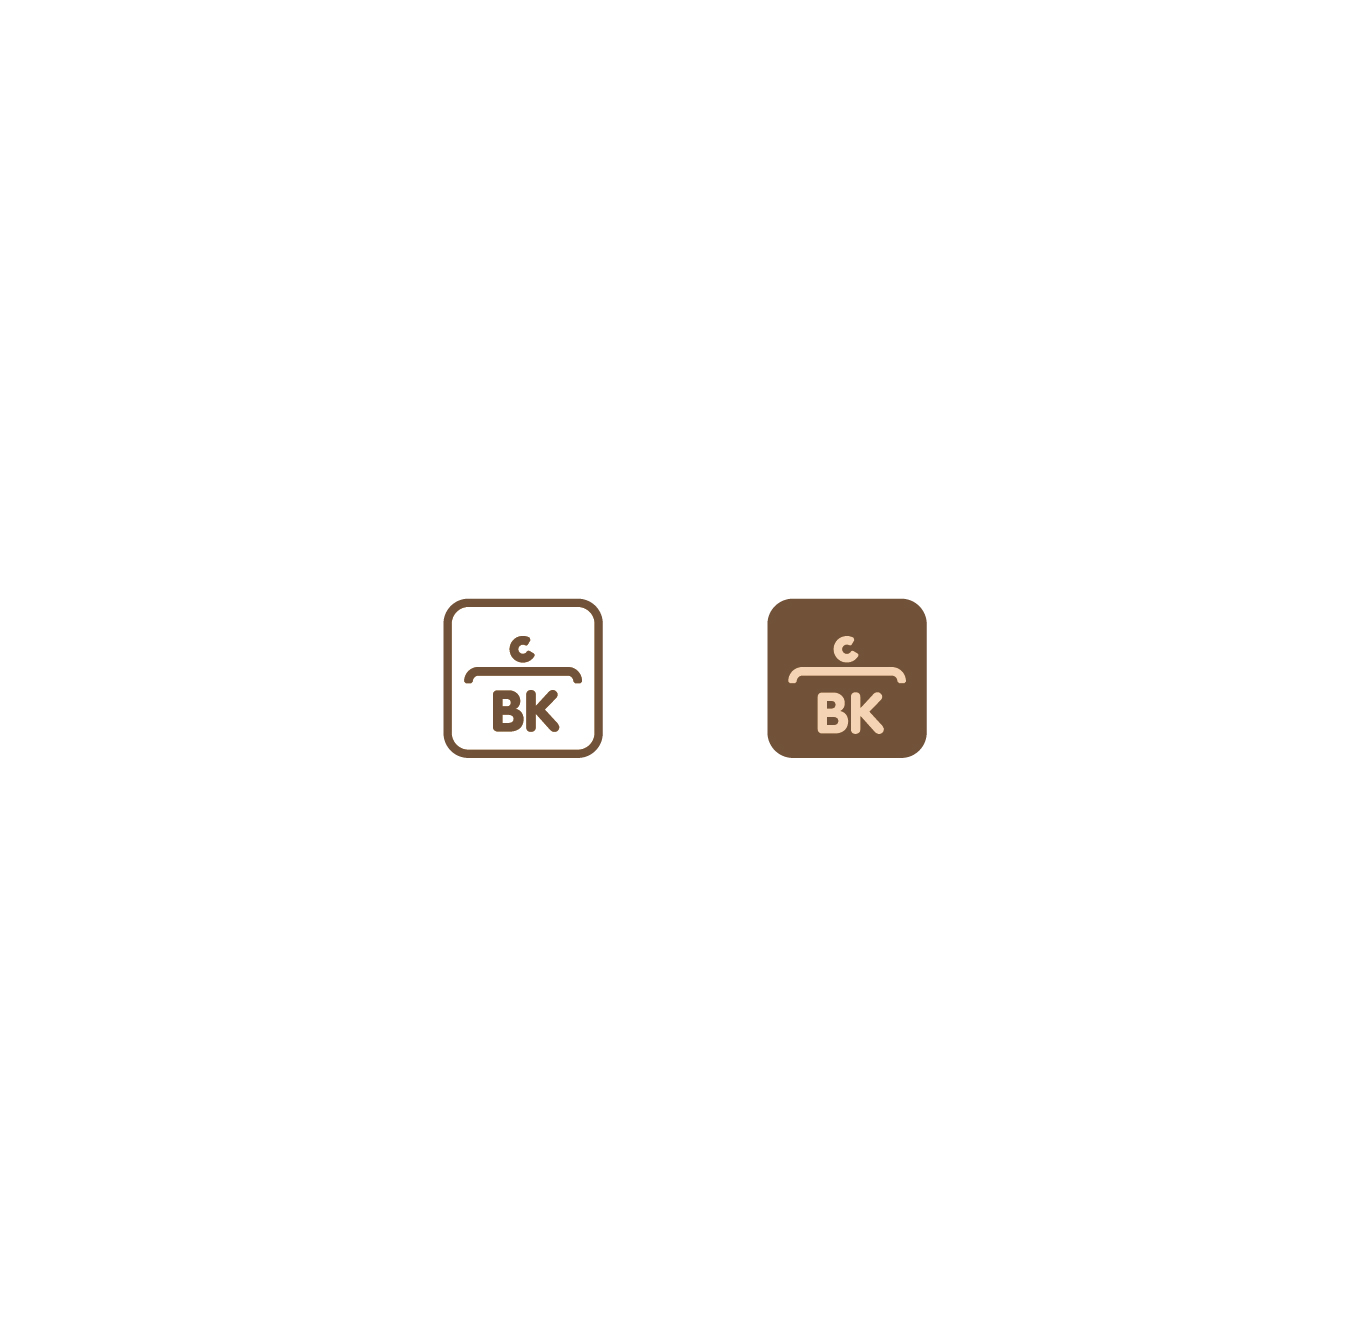 Логотип, фавикон и визитка для компании Винком Пласт  фото f_4215c385bf5e17c2.jpg